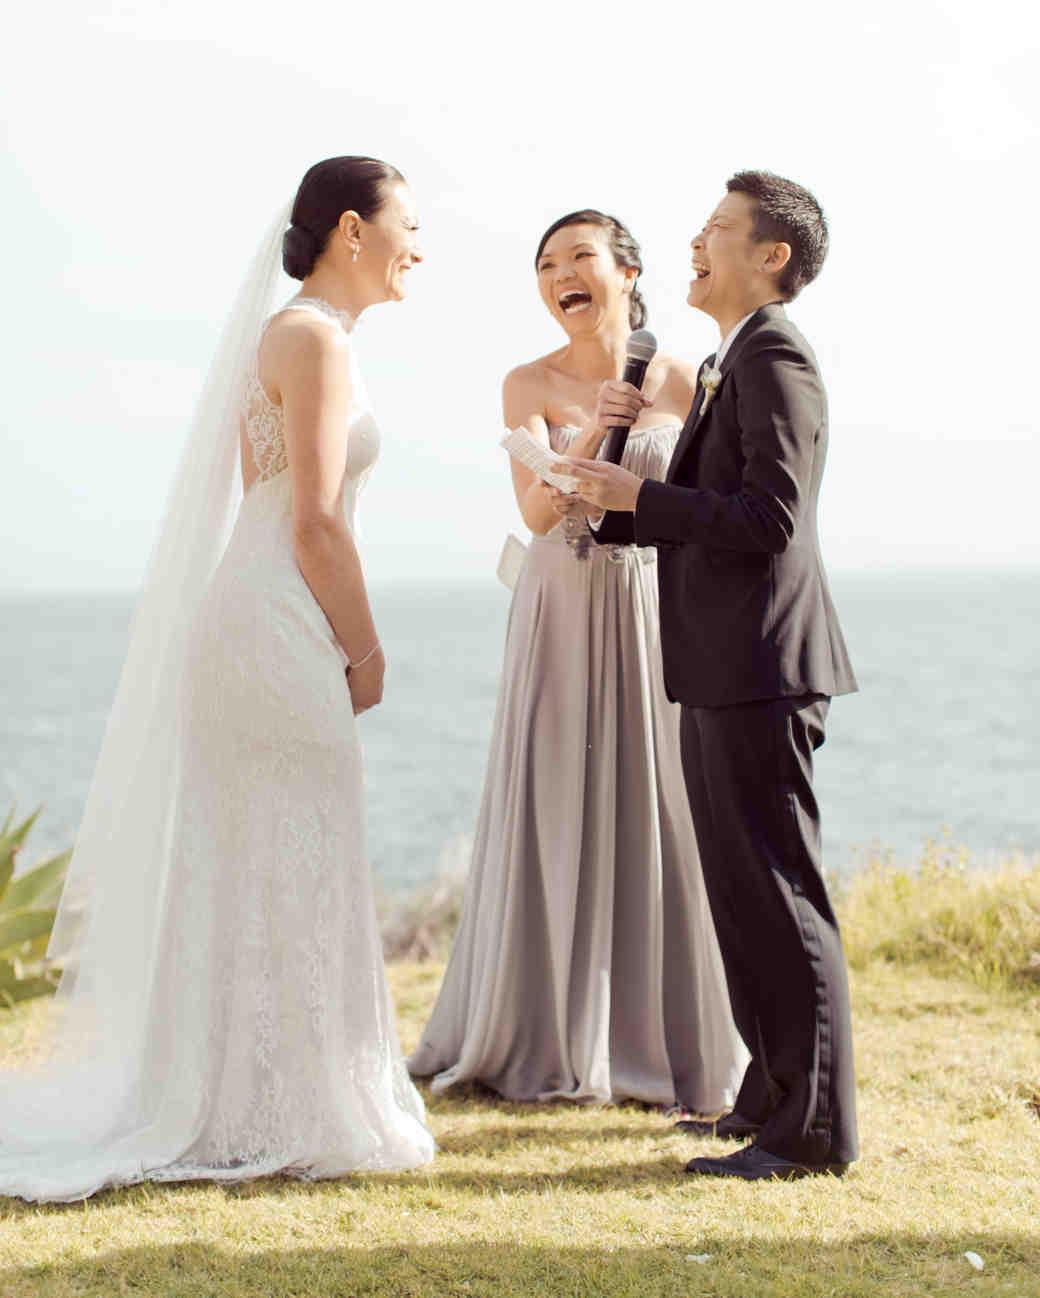 Christian Wedding Script